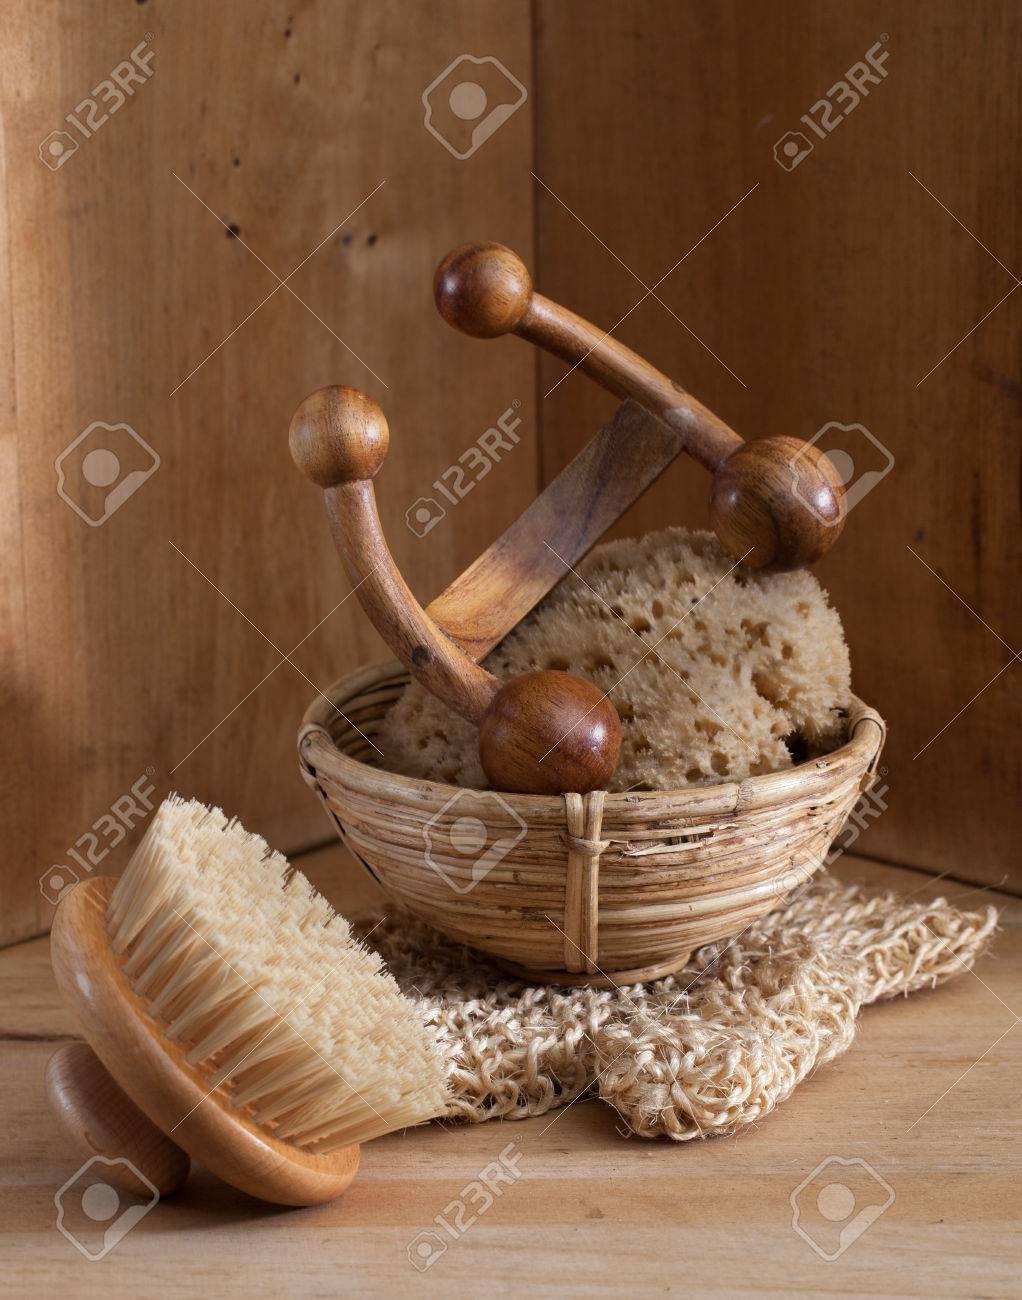 Accessoires Salle De Bain Turquie ~ hammam bain turc ou sauna fond de bois avec une brosse su doise du